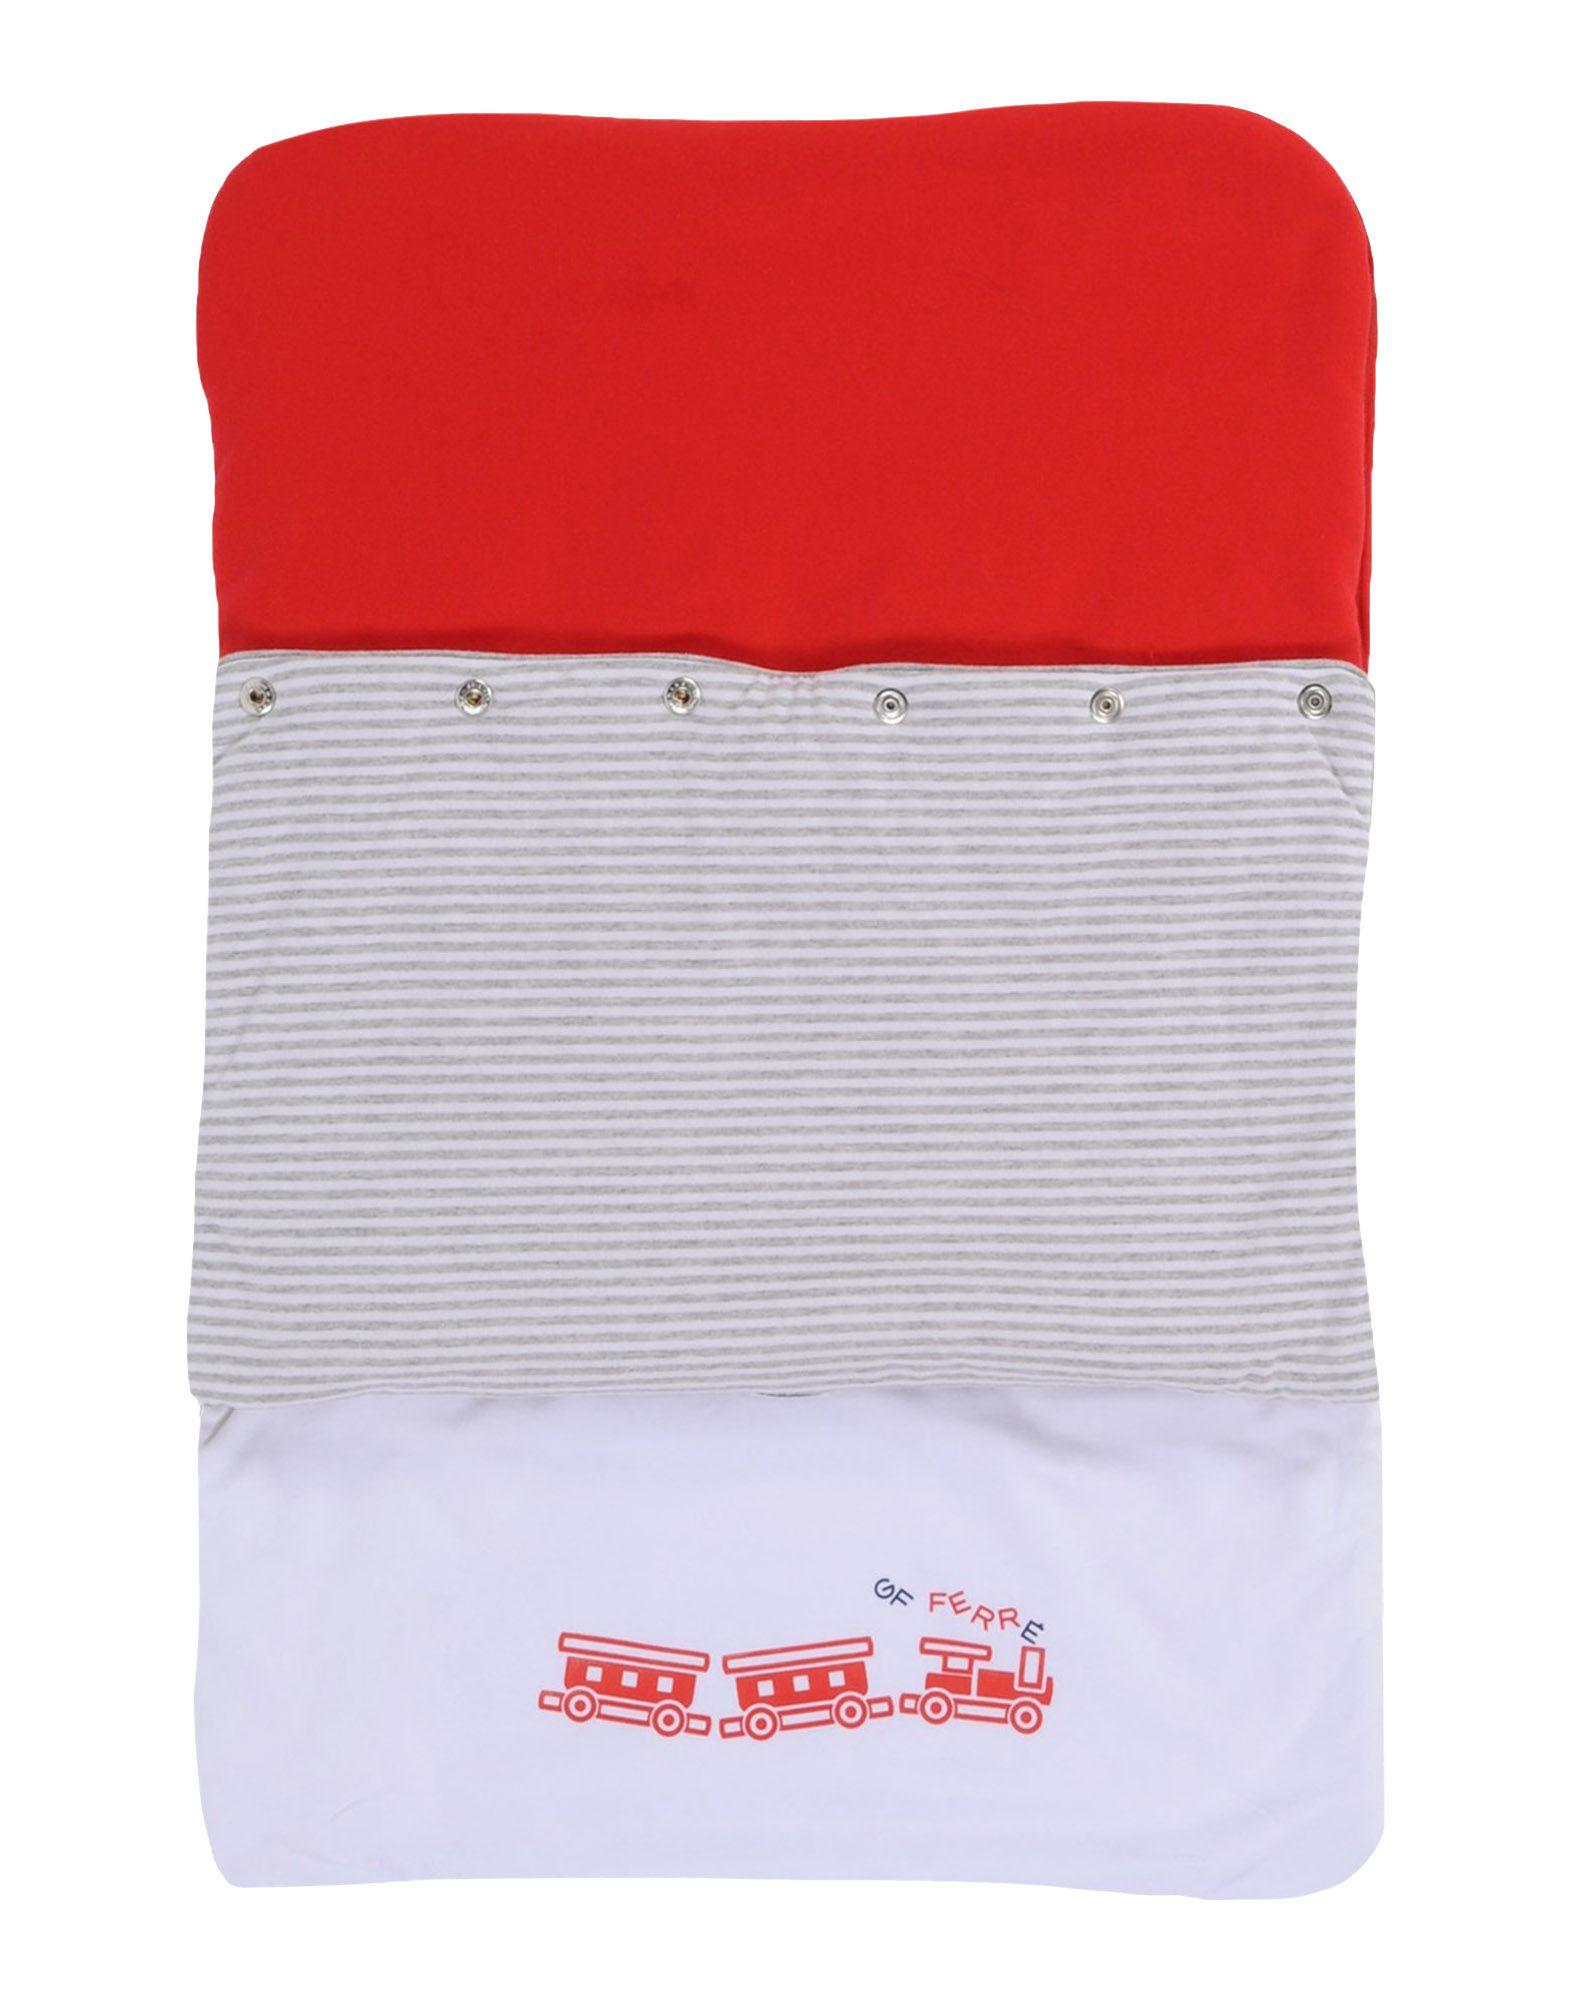 GF FERRE' Одеяльце для младенцев molo одеяльце для младенцев